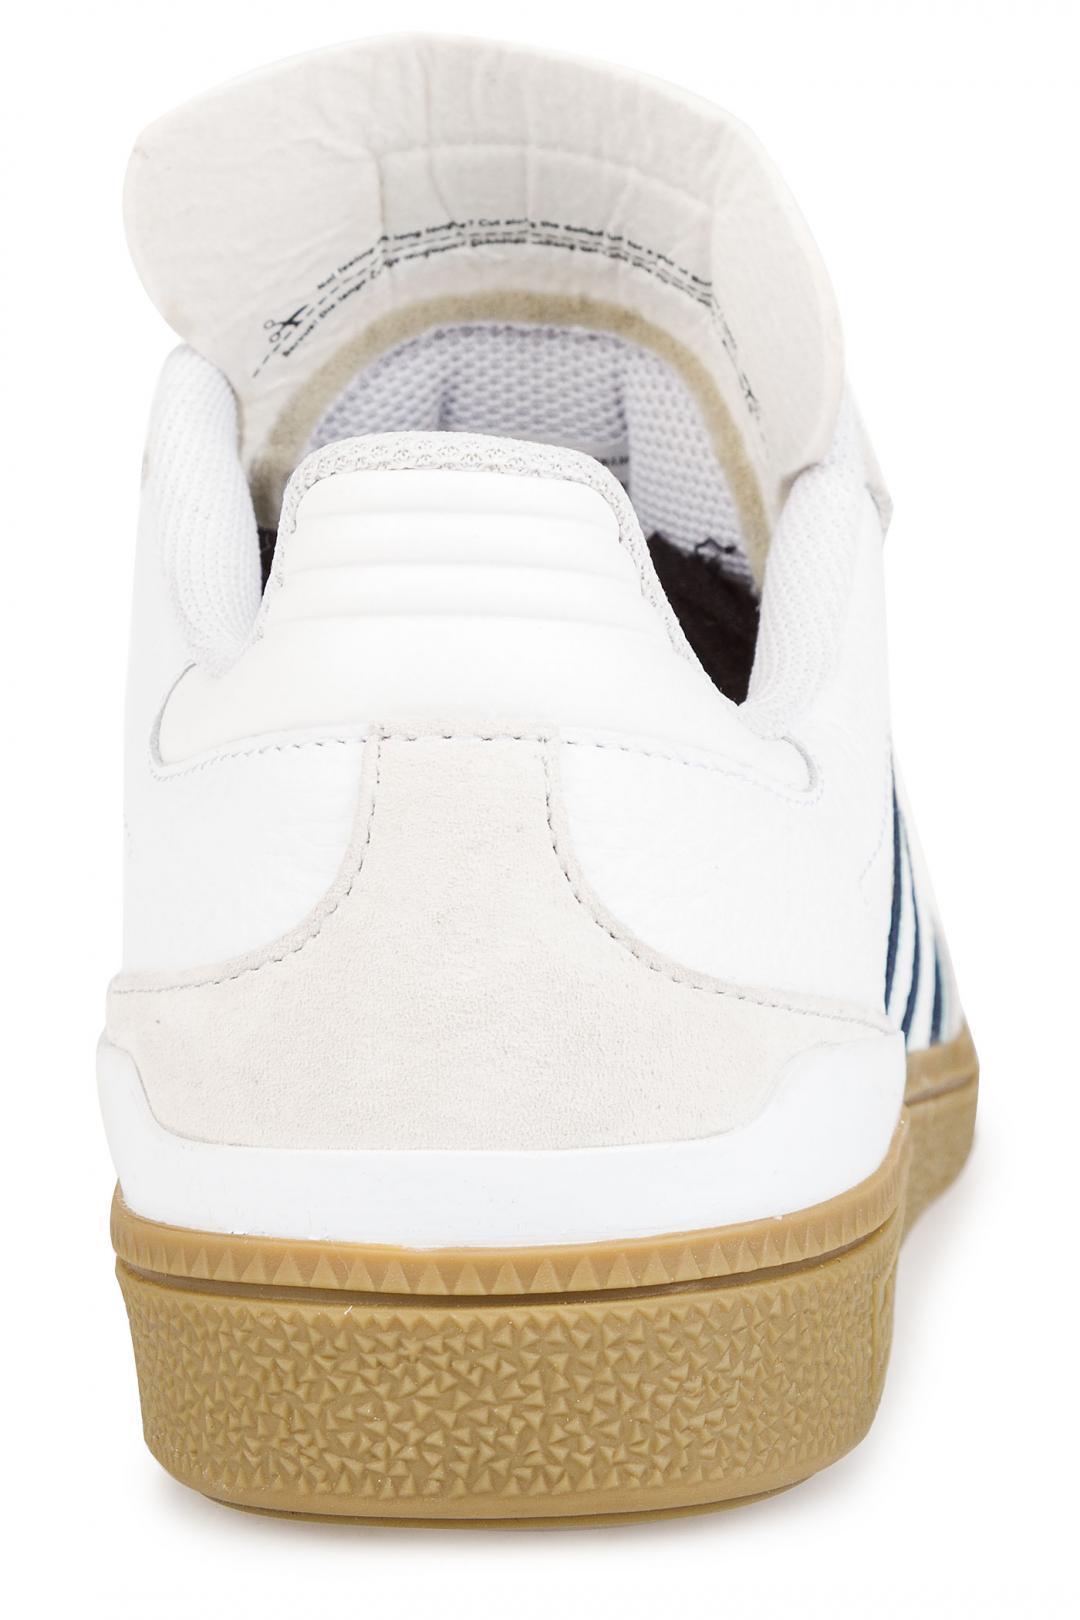 Uomo adidas Skateboarding Busenitz white collegiate burgundy clear | Sneakers low top